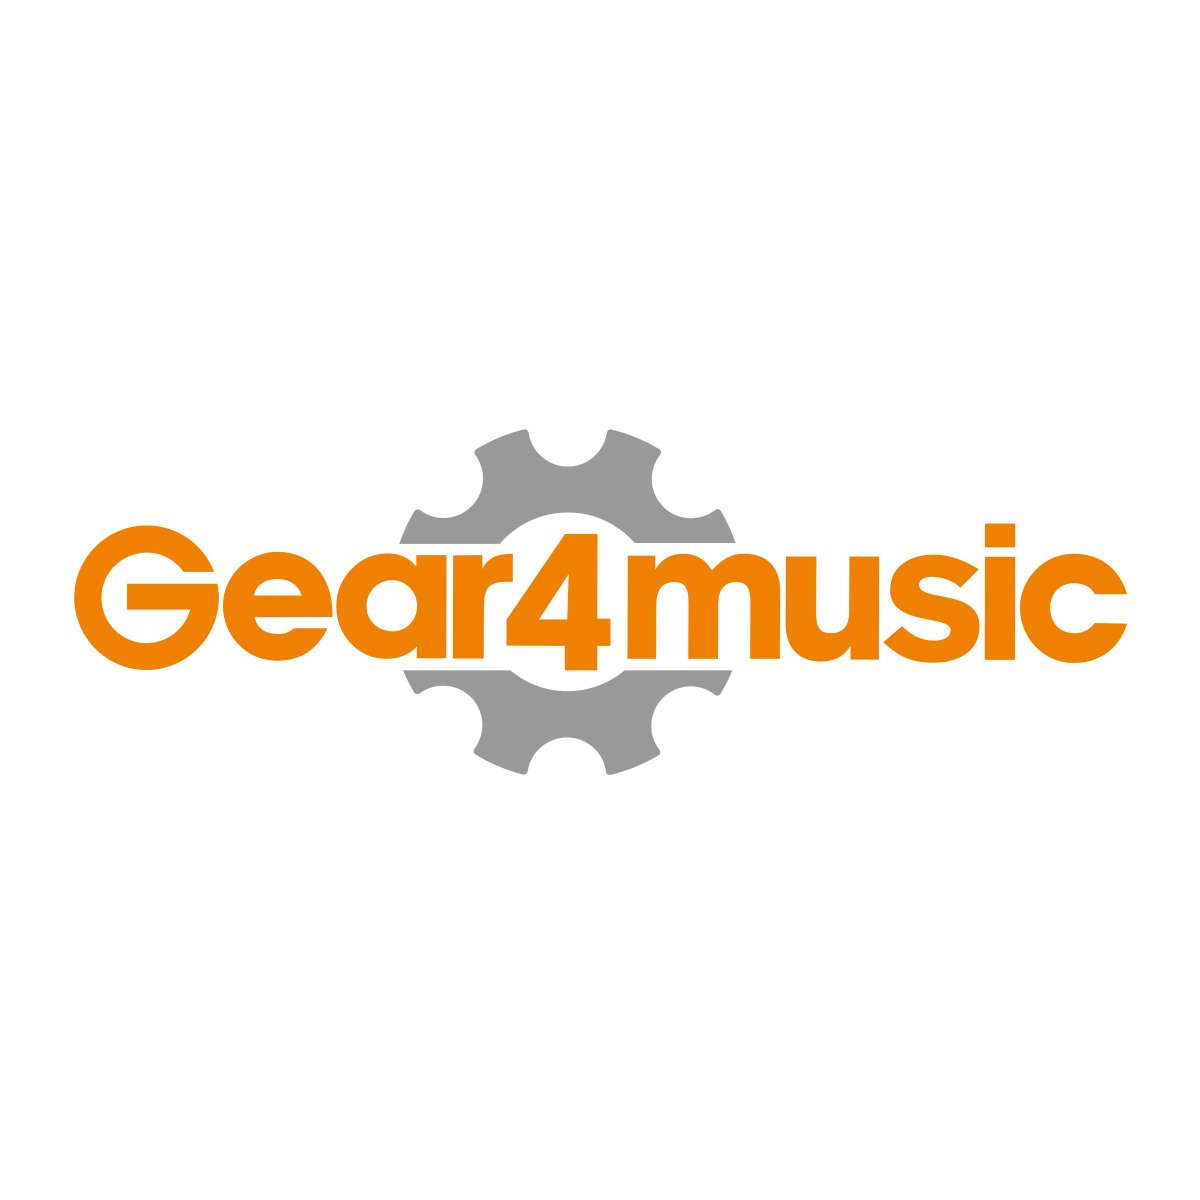 greg bennett ultramatic um 3 electric guitar orange sunburst at gear4music. Black Bedroom Furniture Sets. Home Design Ideas